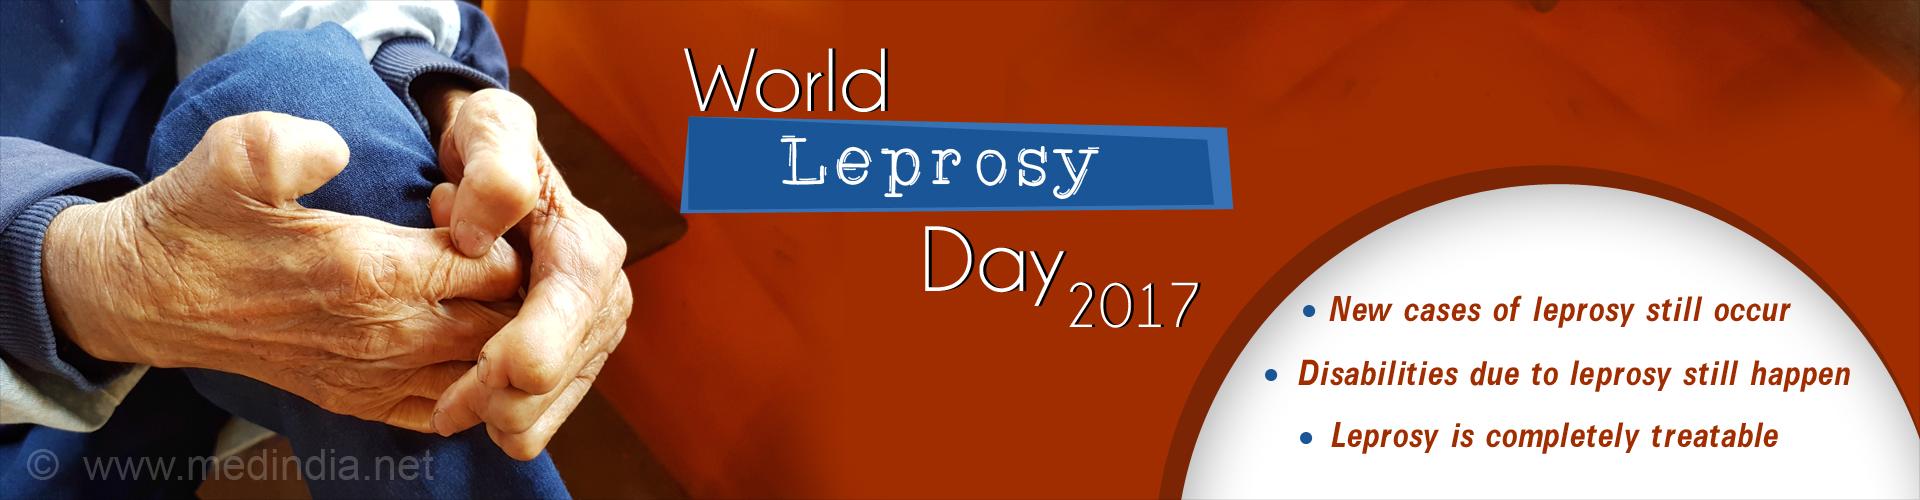 The World Leprosy Day 2017